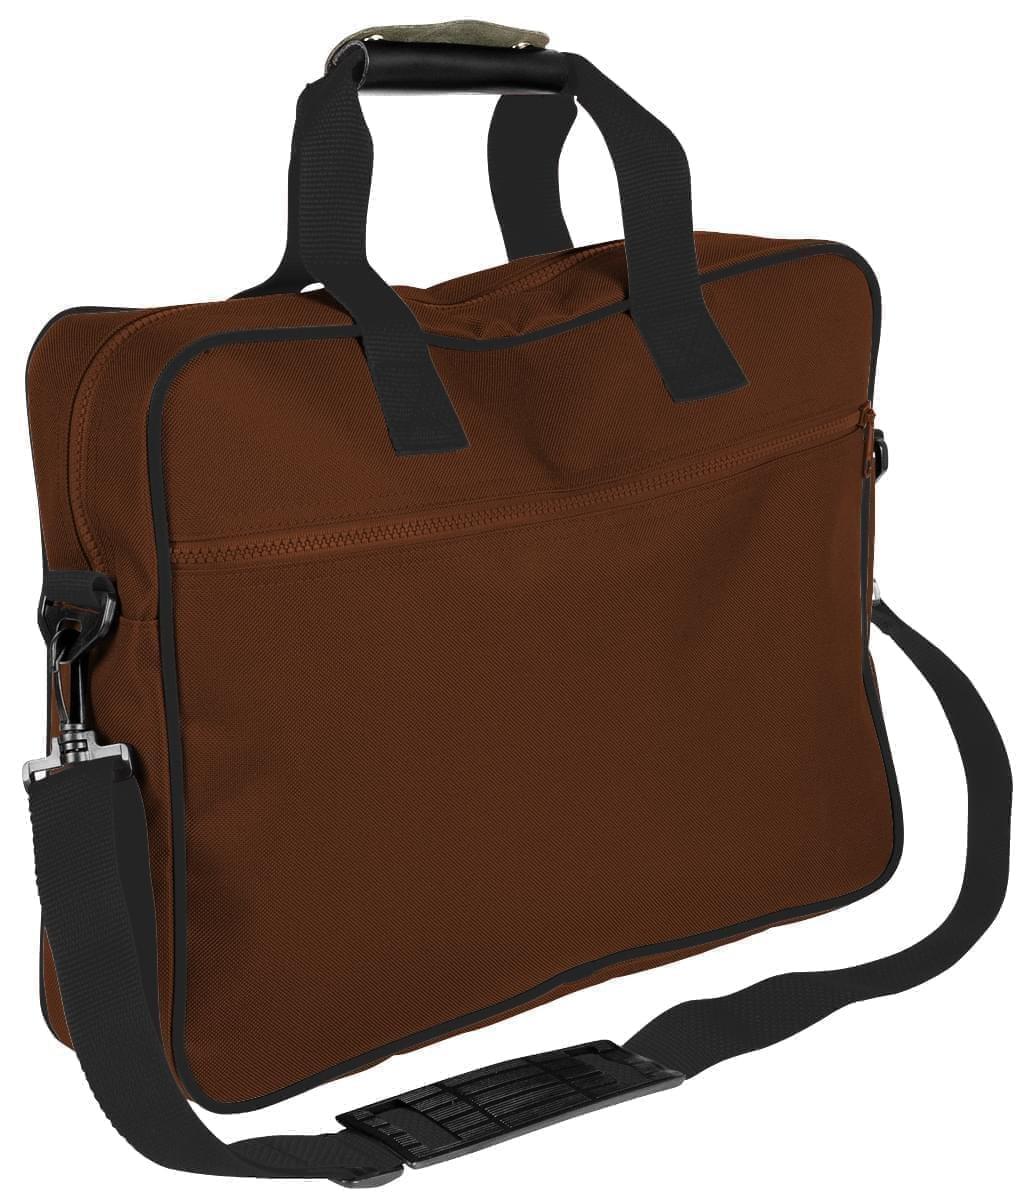 USA Made Nylon Poly Notebook Sleeves, Brown-Black, CPKVA59PPR